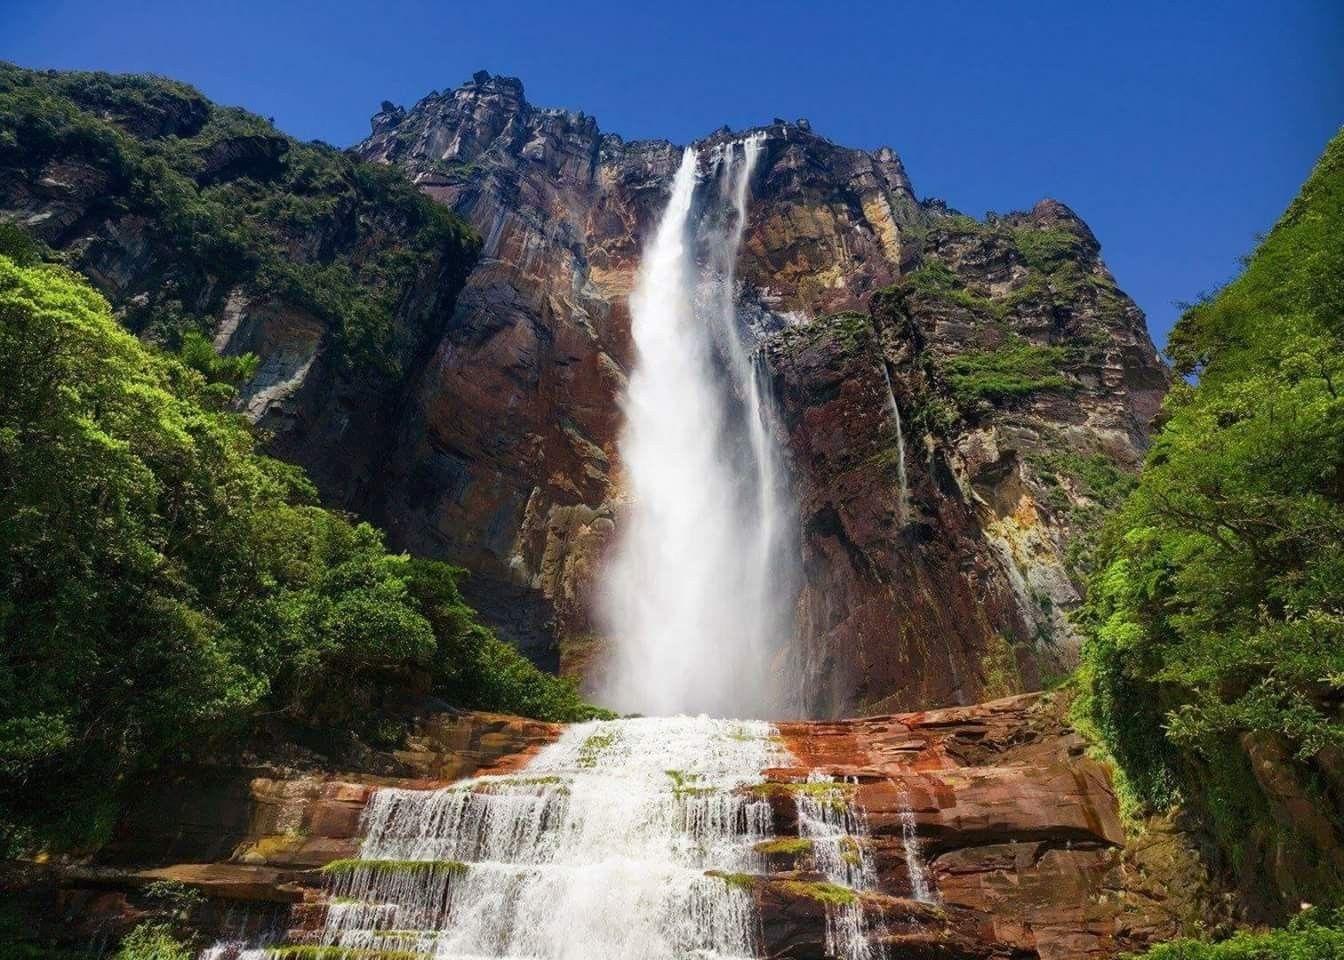 Angel Falls, Venezuela. | Angel falls venezuela, Largest ...